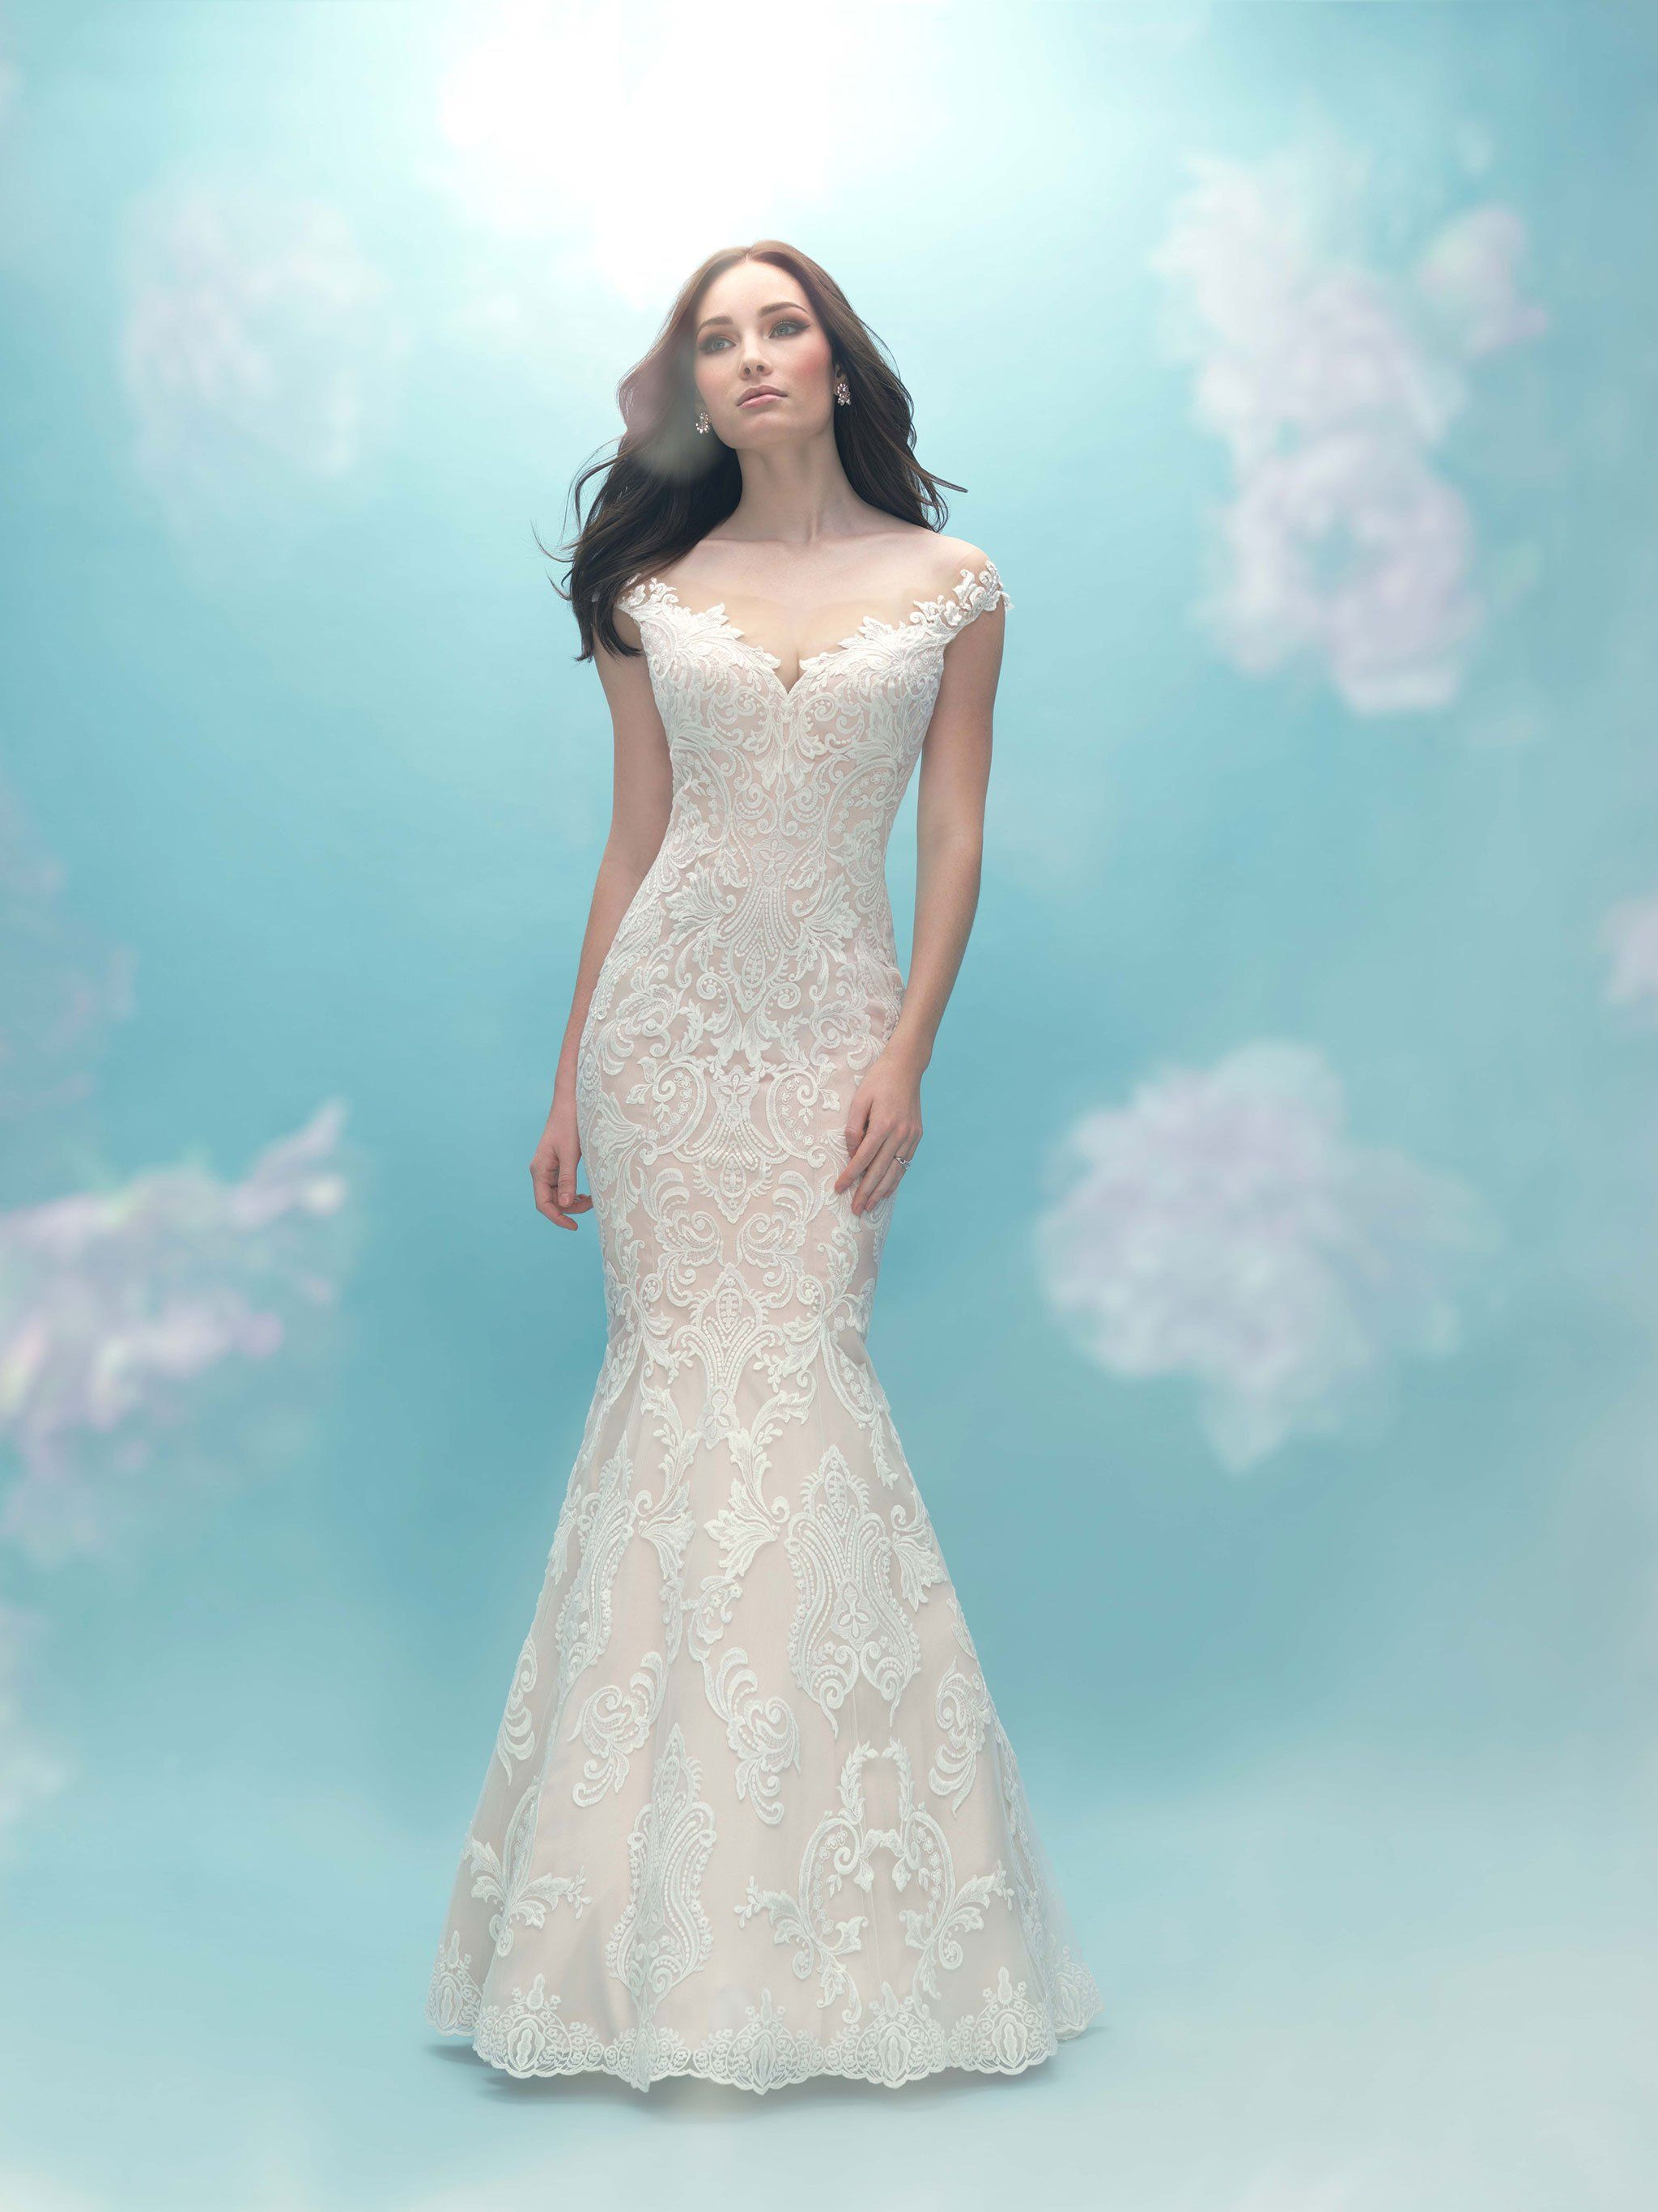 Dorable Wedding Dress St Albans Inspiration - All Wedding Dresses ...